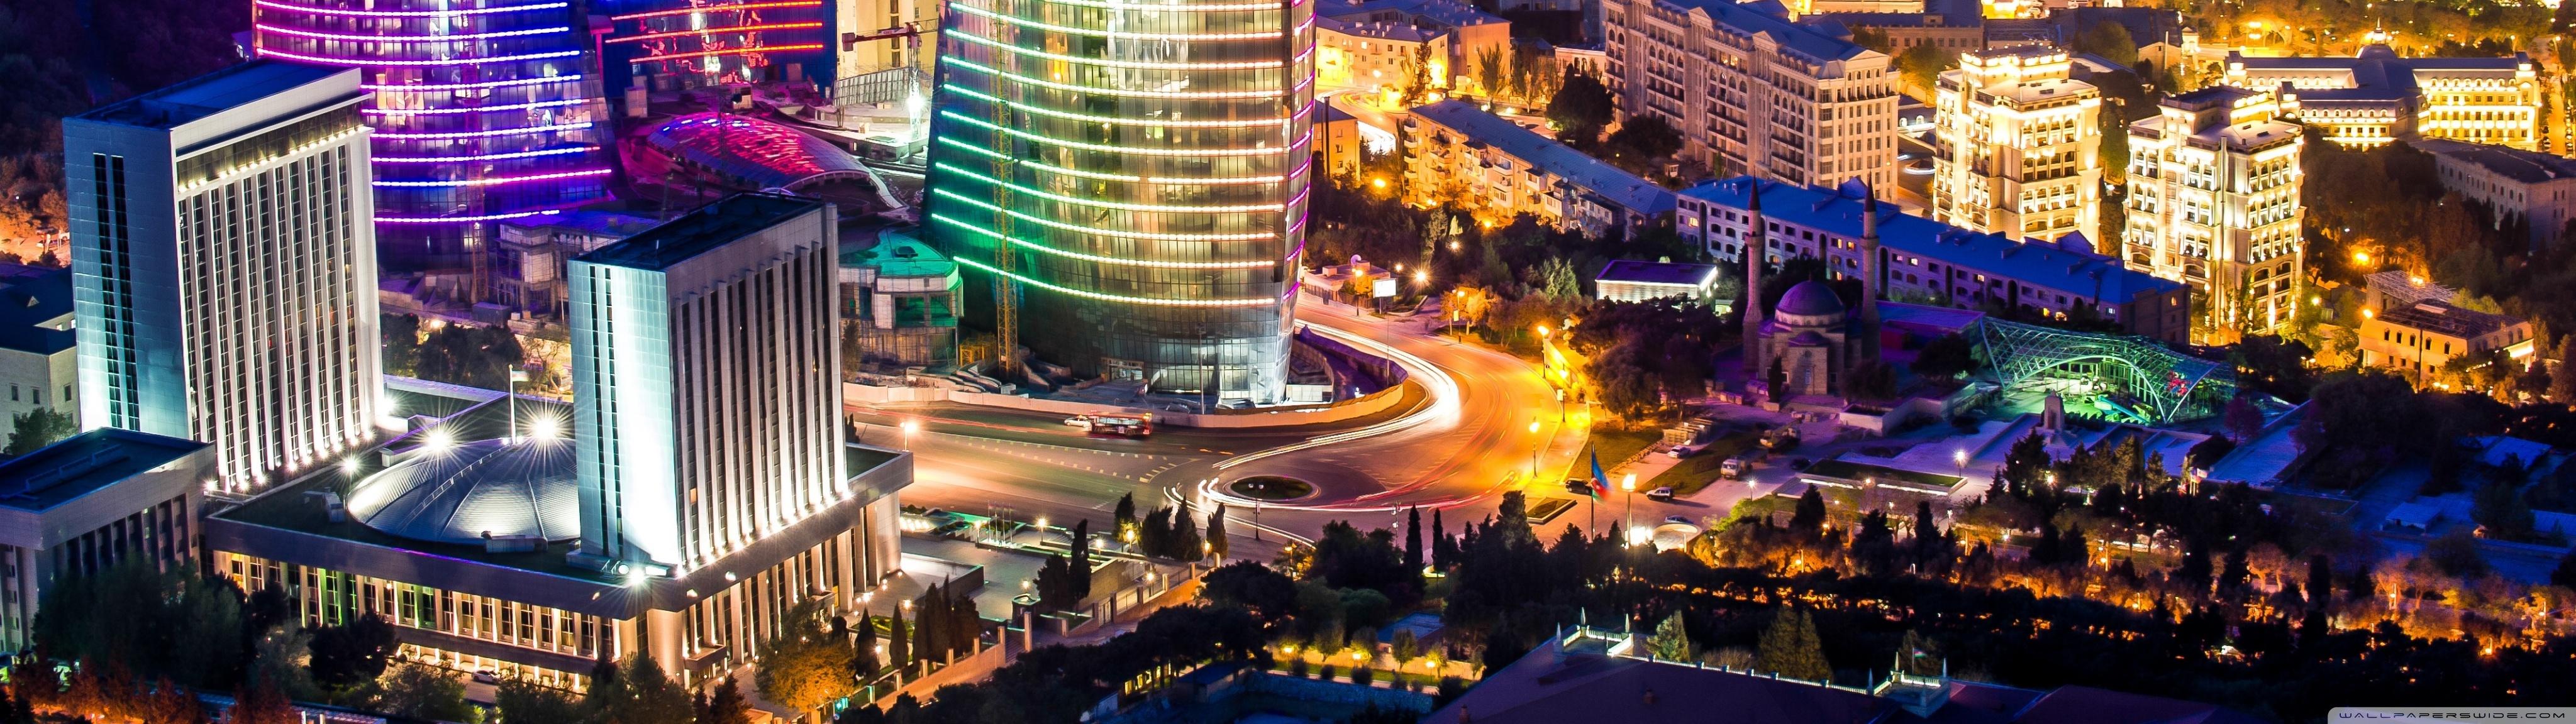 Flame Towers Baku Azerbaijan 4K HD Desktop Wallpaper for 4096x1152